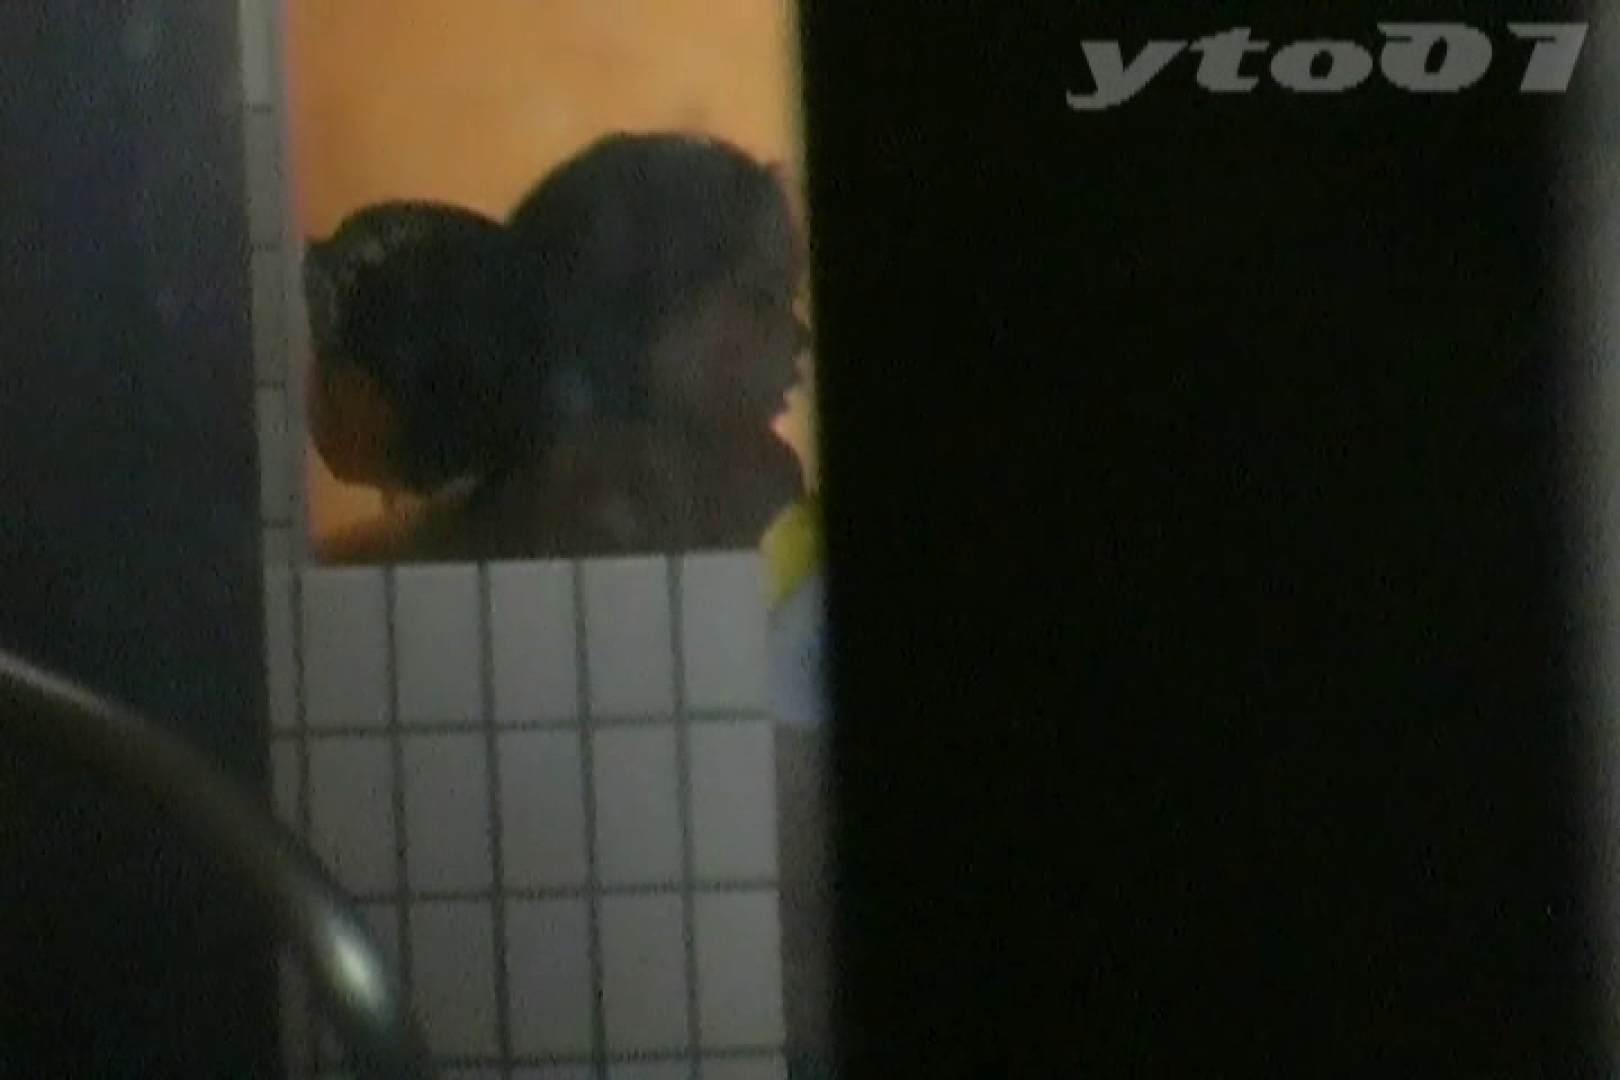 ▲復活限定▲合宿ホテル女風呂盗撮 Vol.05 盗撮で悶絶 濡れ場動画紹介 87画像 21